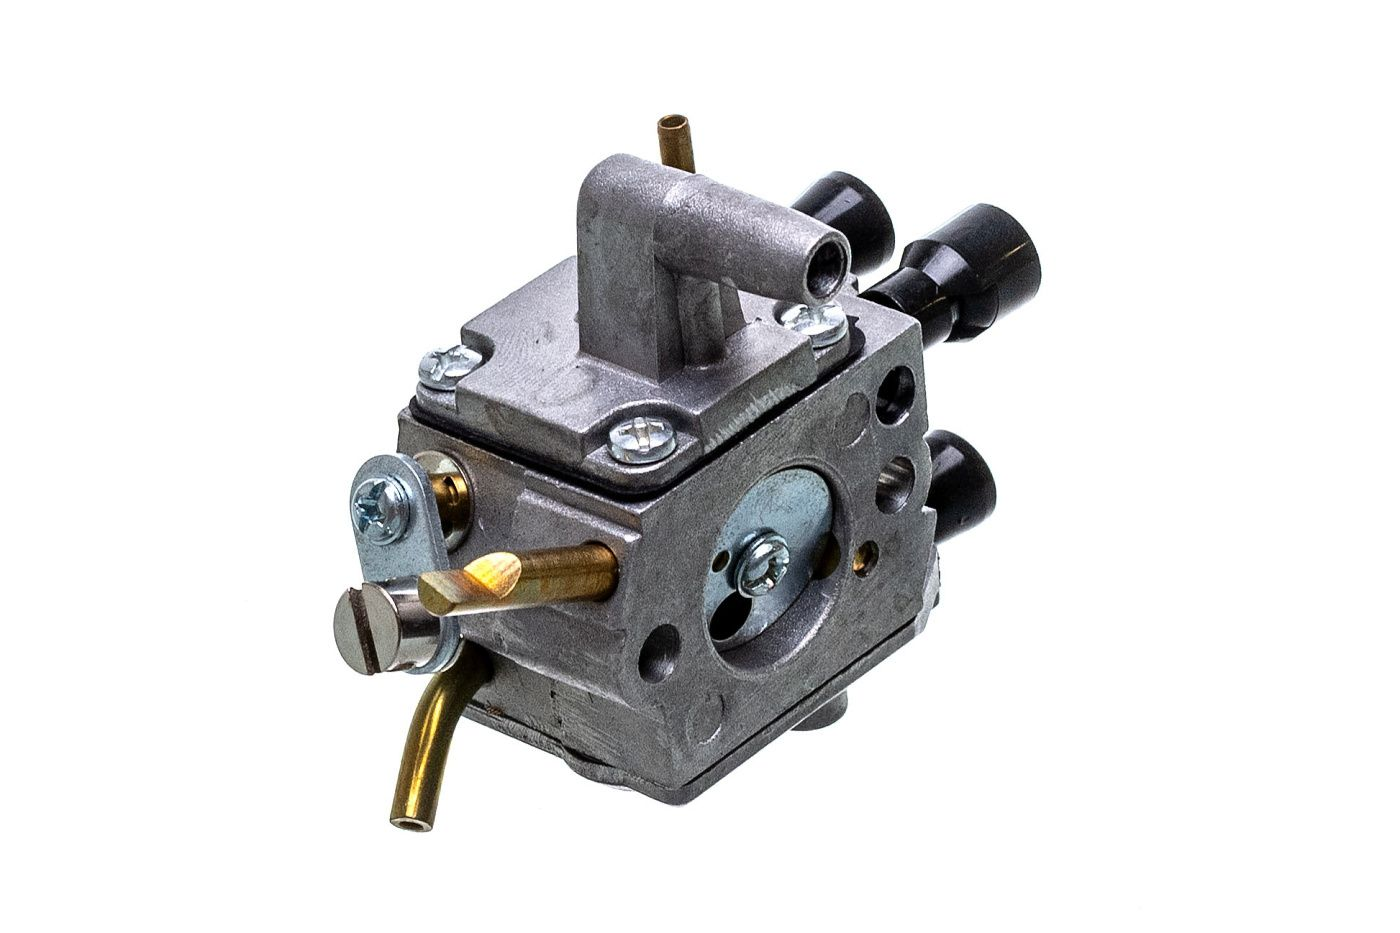 Karburátor Stihl FS120 FS200 FS250 FS300 FS350 - 4134 120 0603 AKCIA